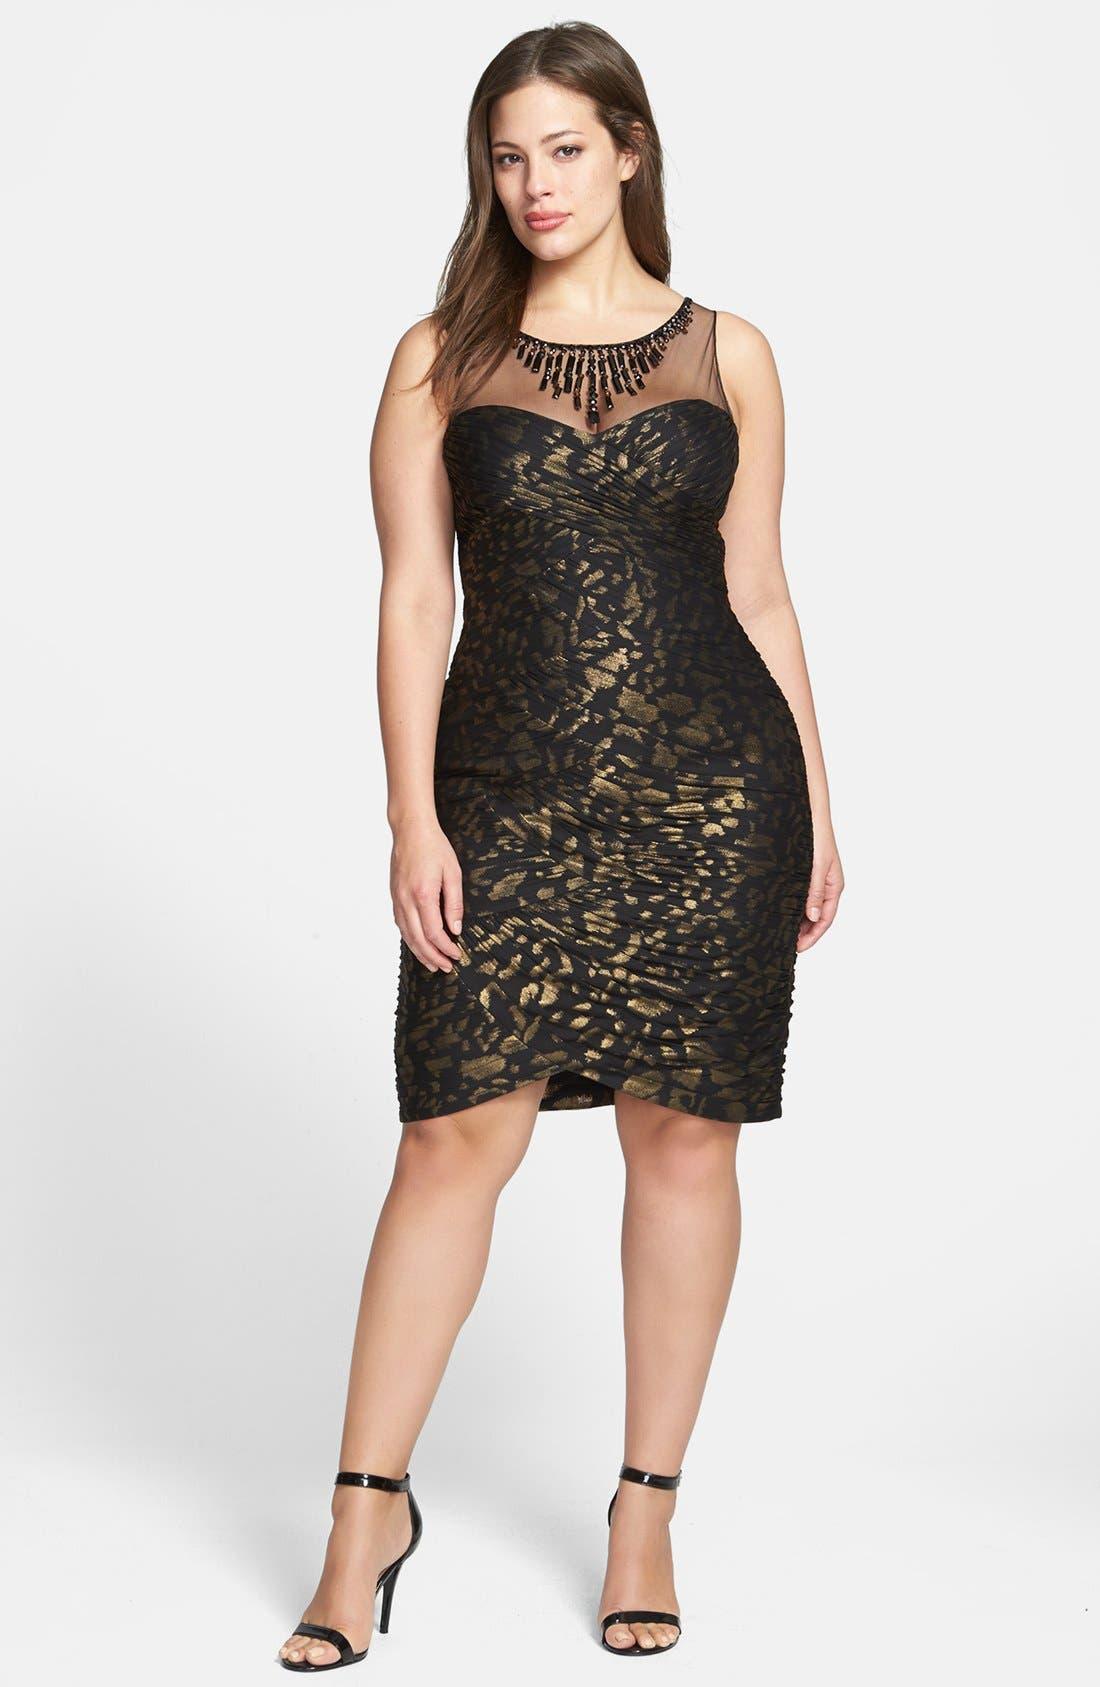 Alternate Image 1 Selected - Adrianna Papell Metallic Pattern Shirred Sheath Dress (Plus Size)